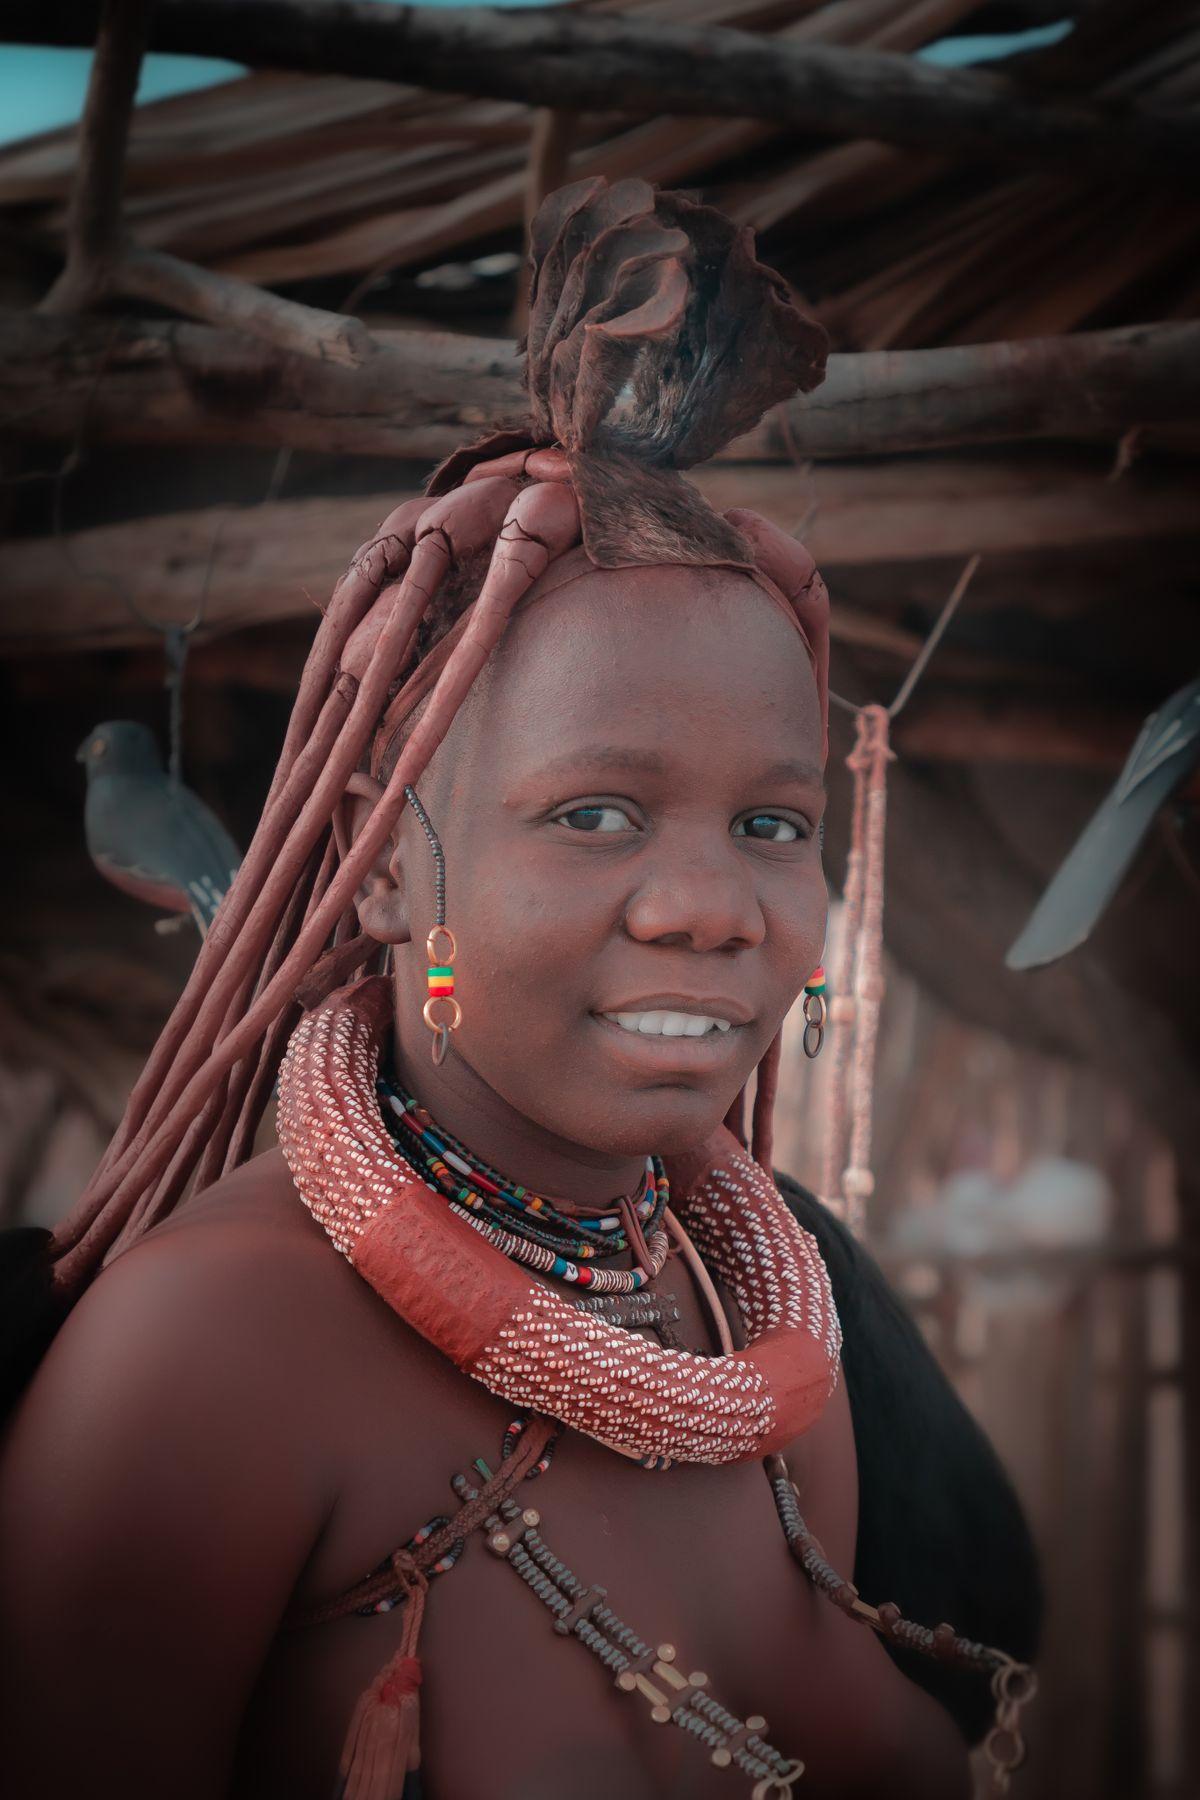 Девушка из племени химба, Намибия химба намибия африка сафари племена